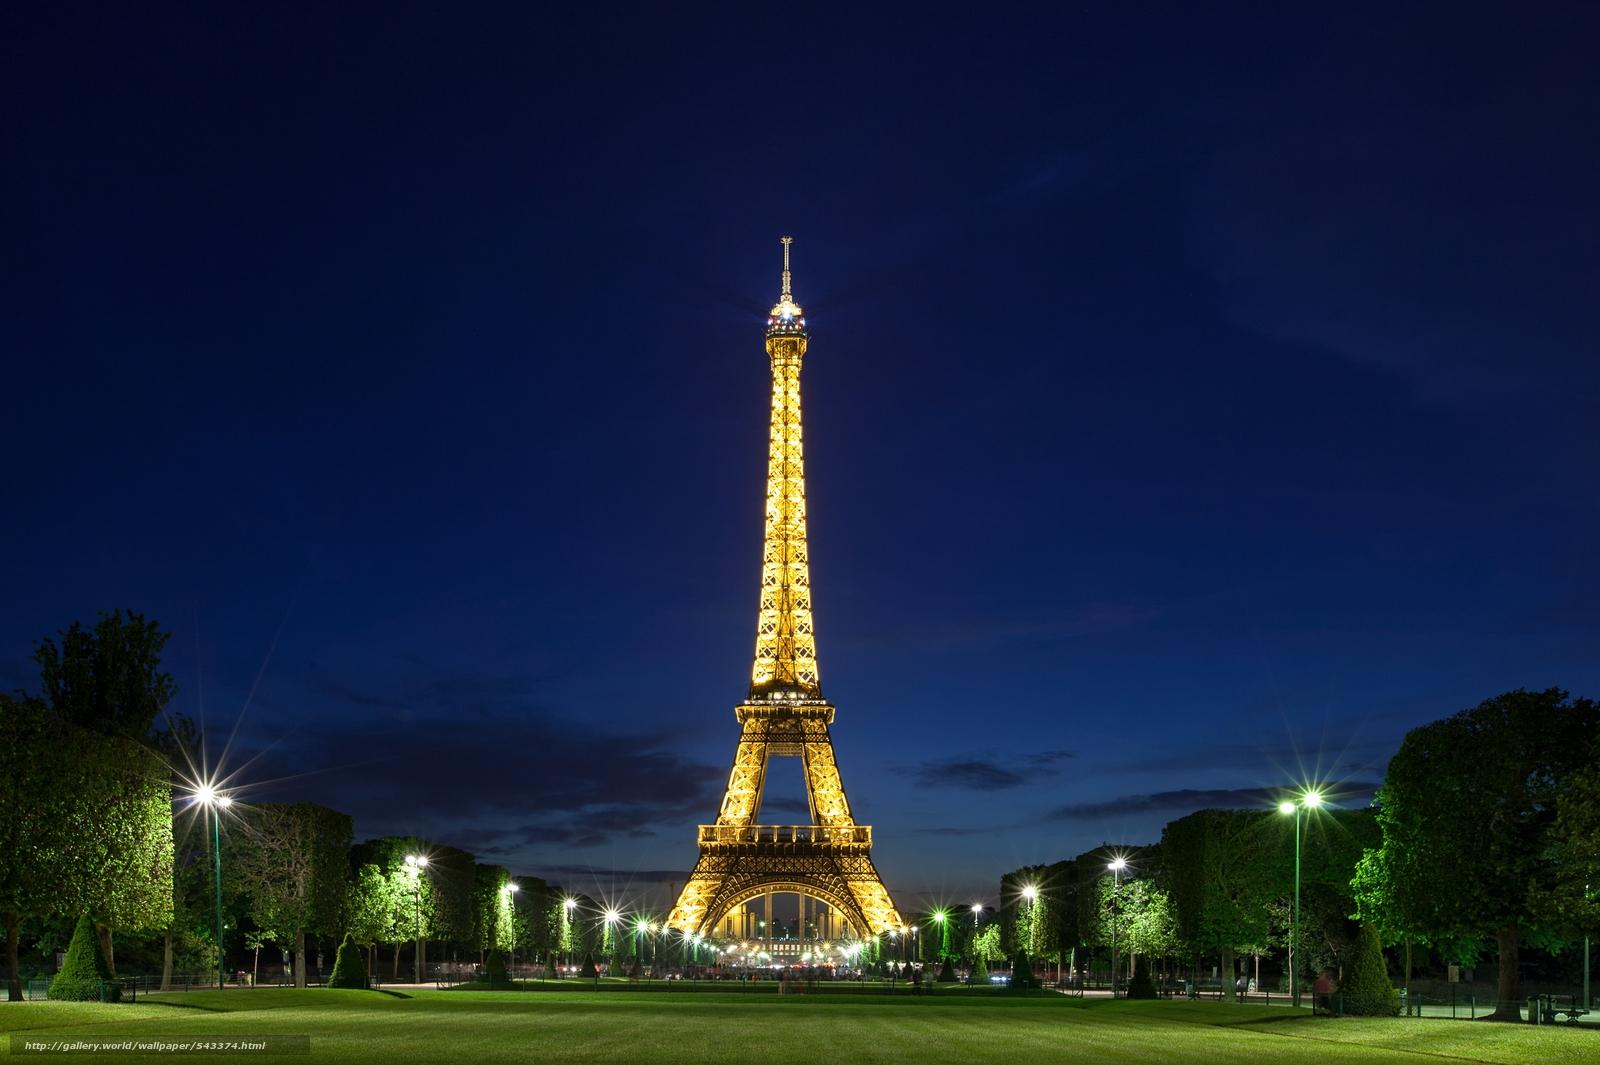 Wallpaper download paris - Download Wallpaper Paris France Eiffel Tower Free Desktop Wallpaper